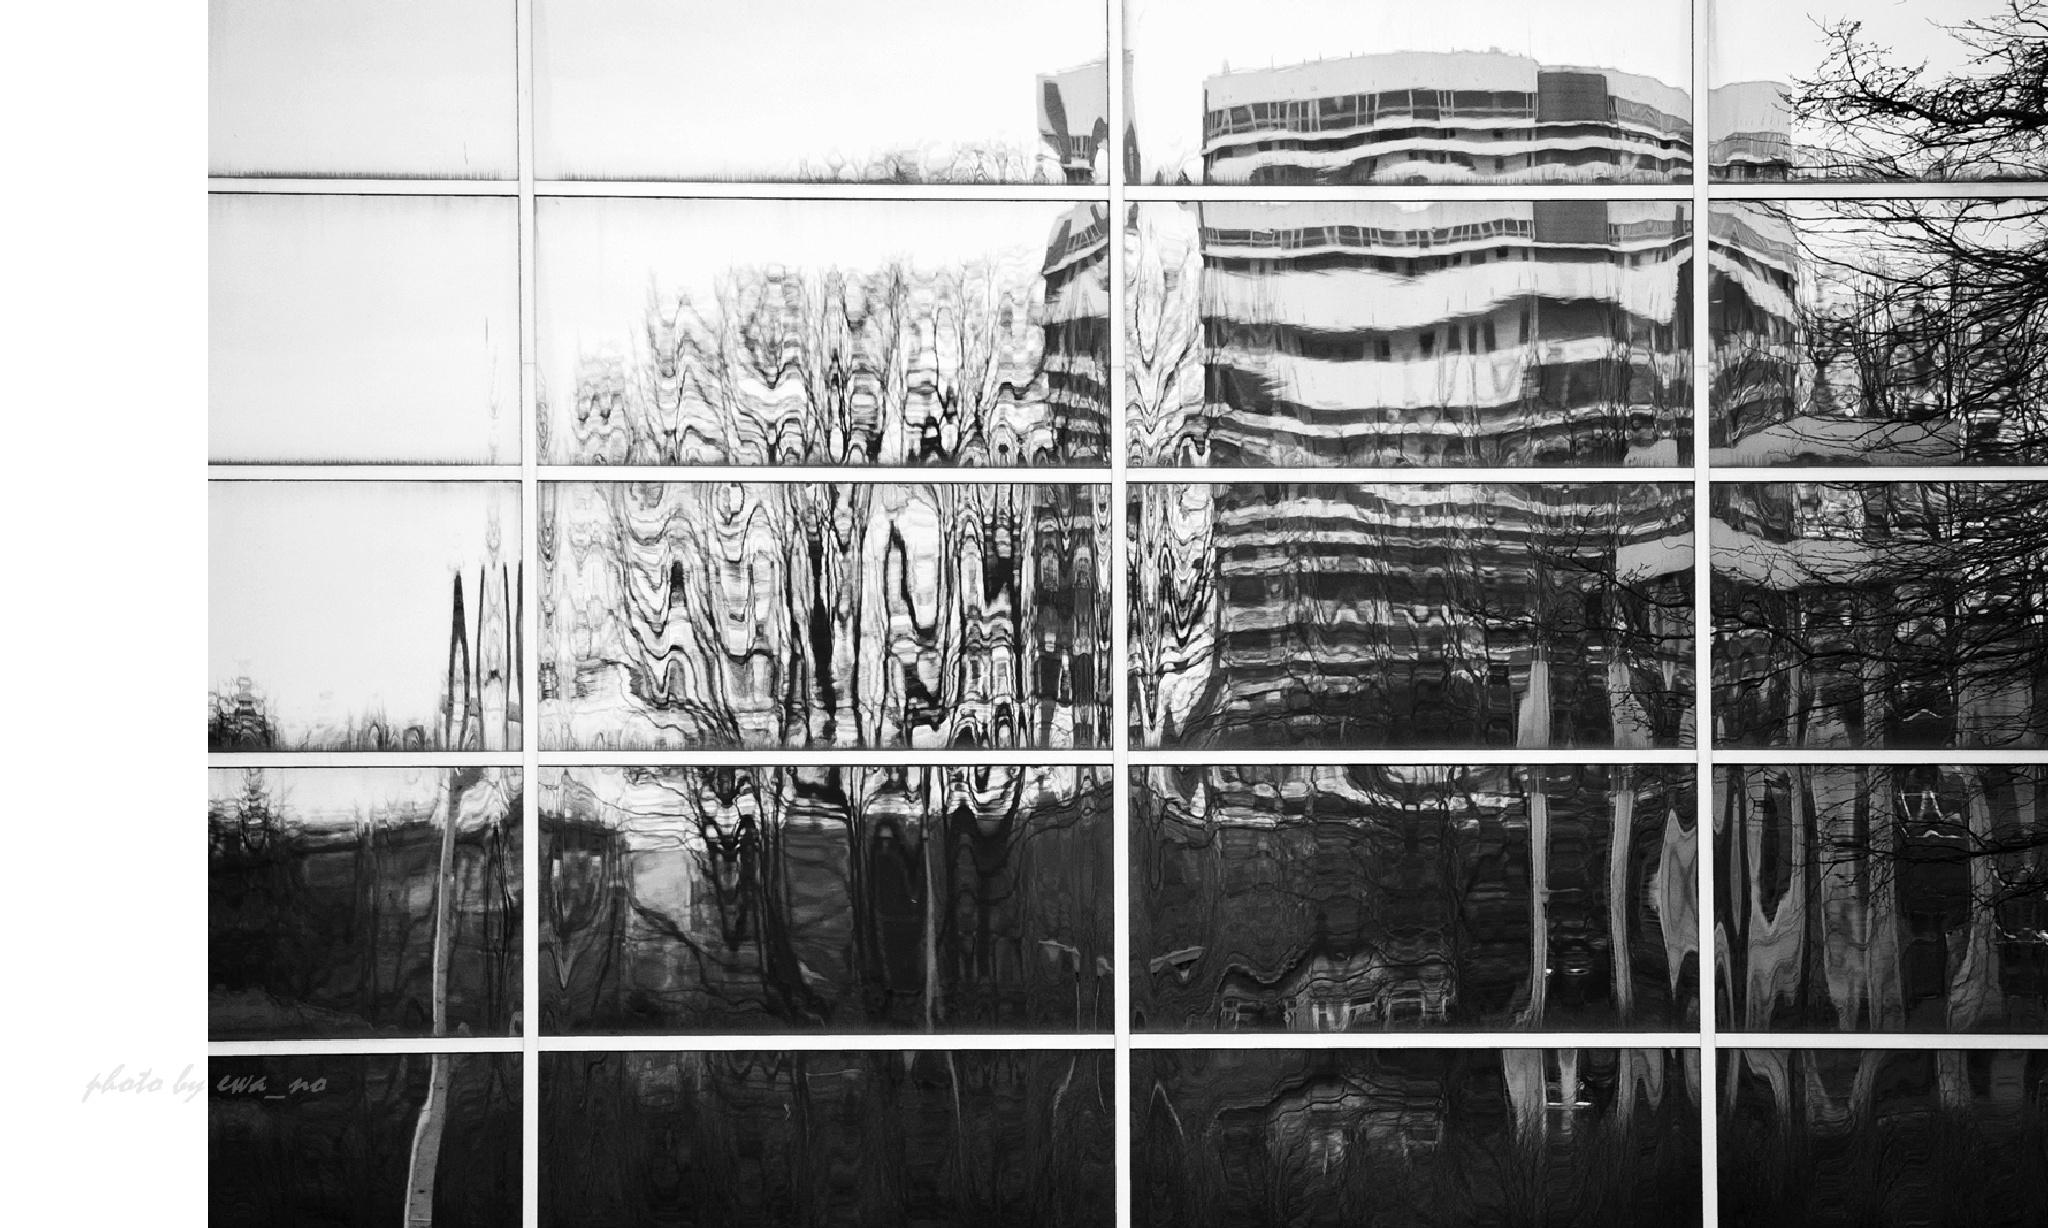 mirror world (in decomposition) by ewa_no